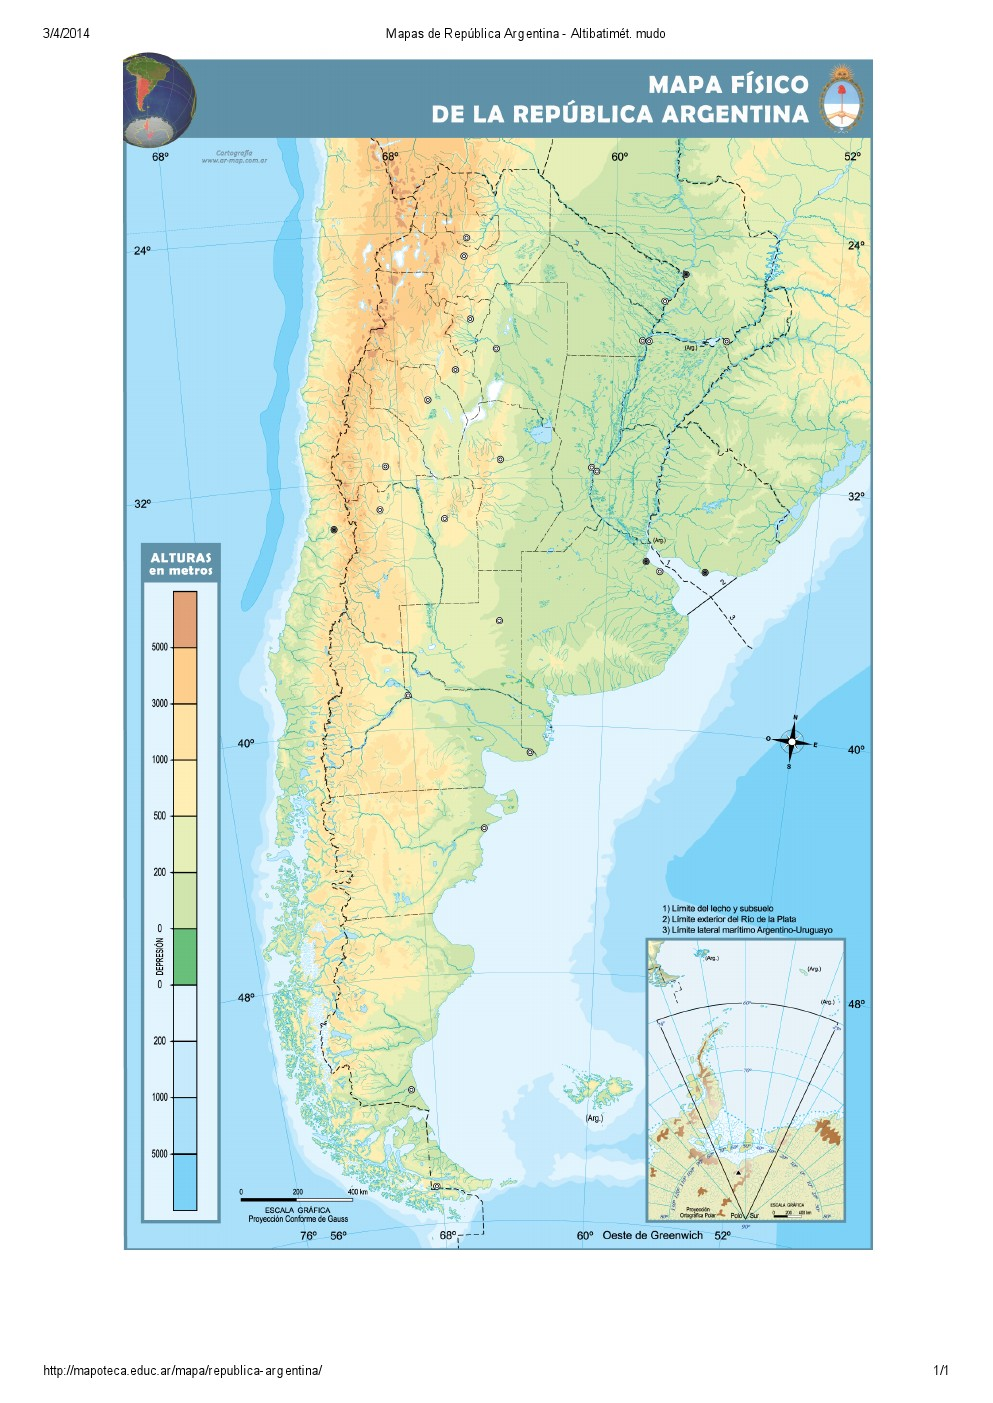 Mapa altibatimétrico mudo de Argentina. Mapoteca de Educ.ar